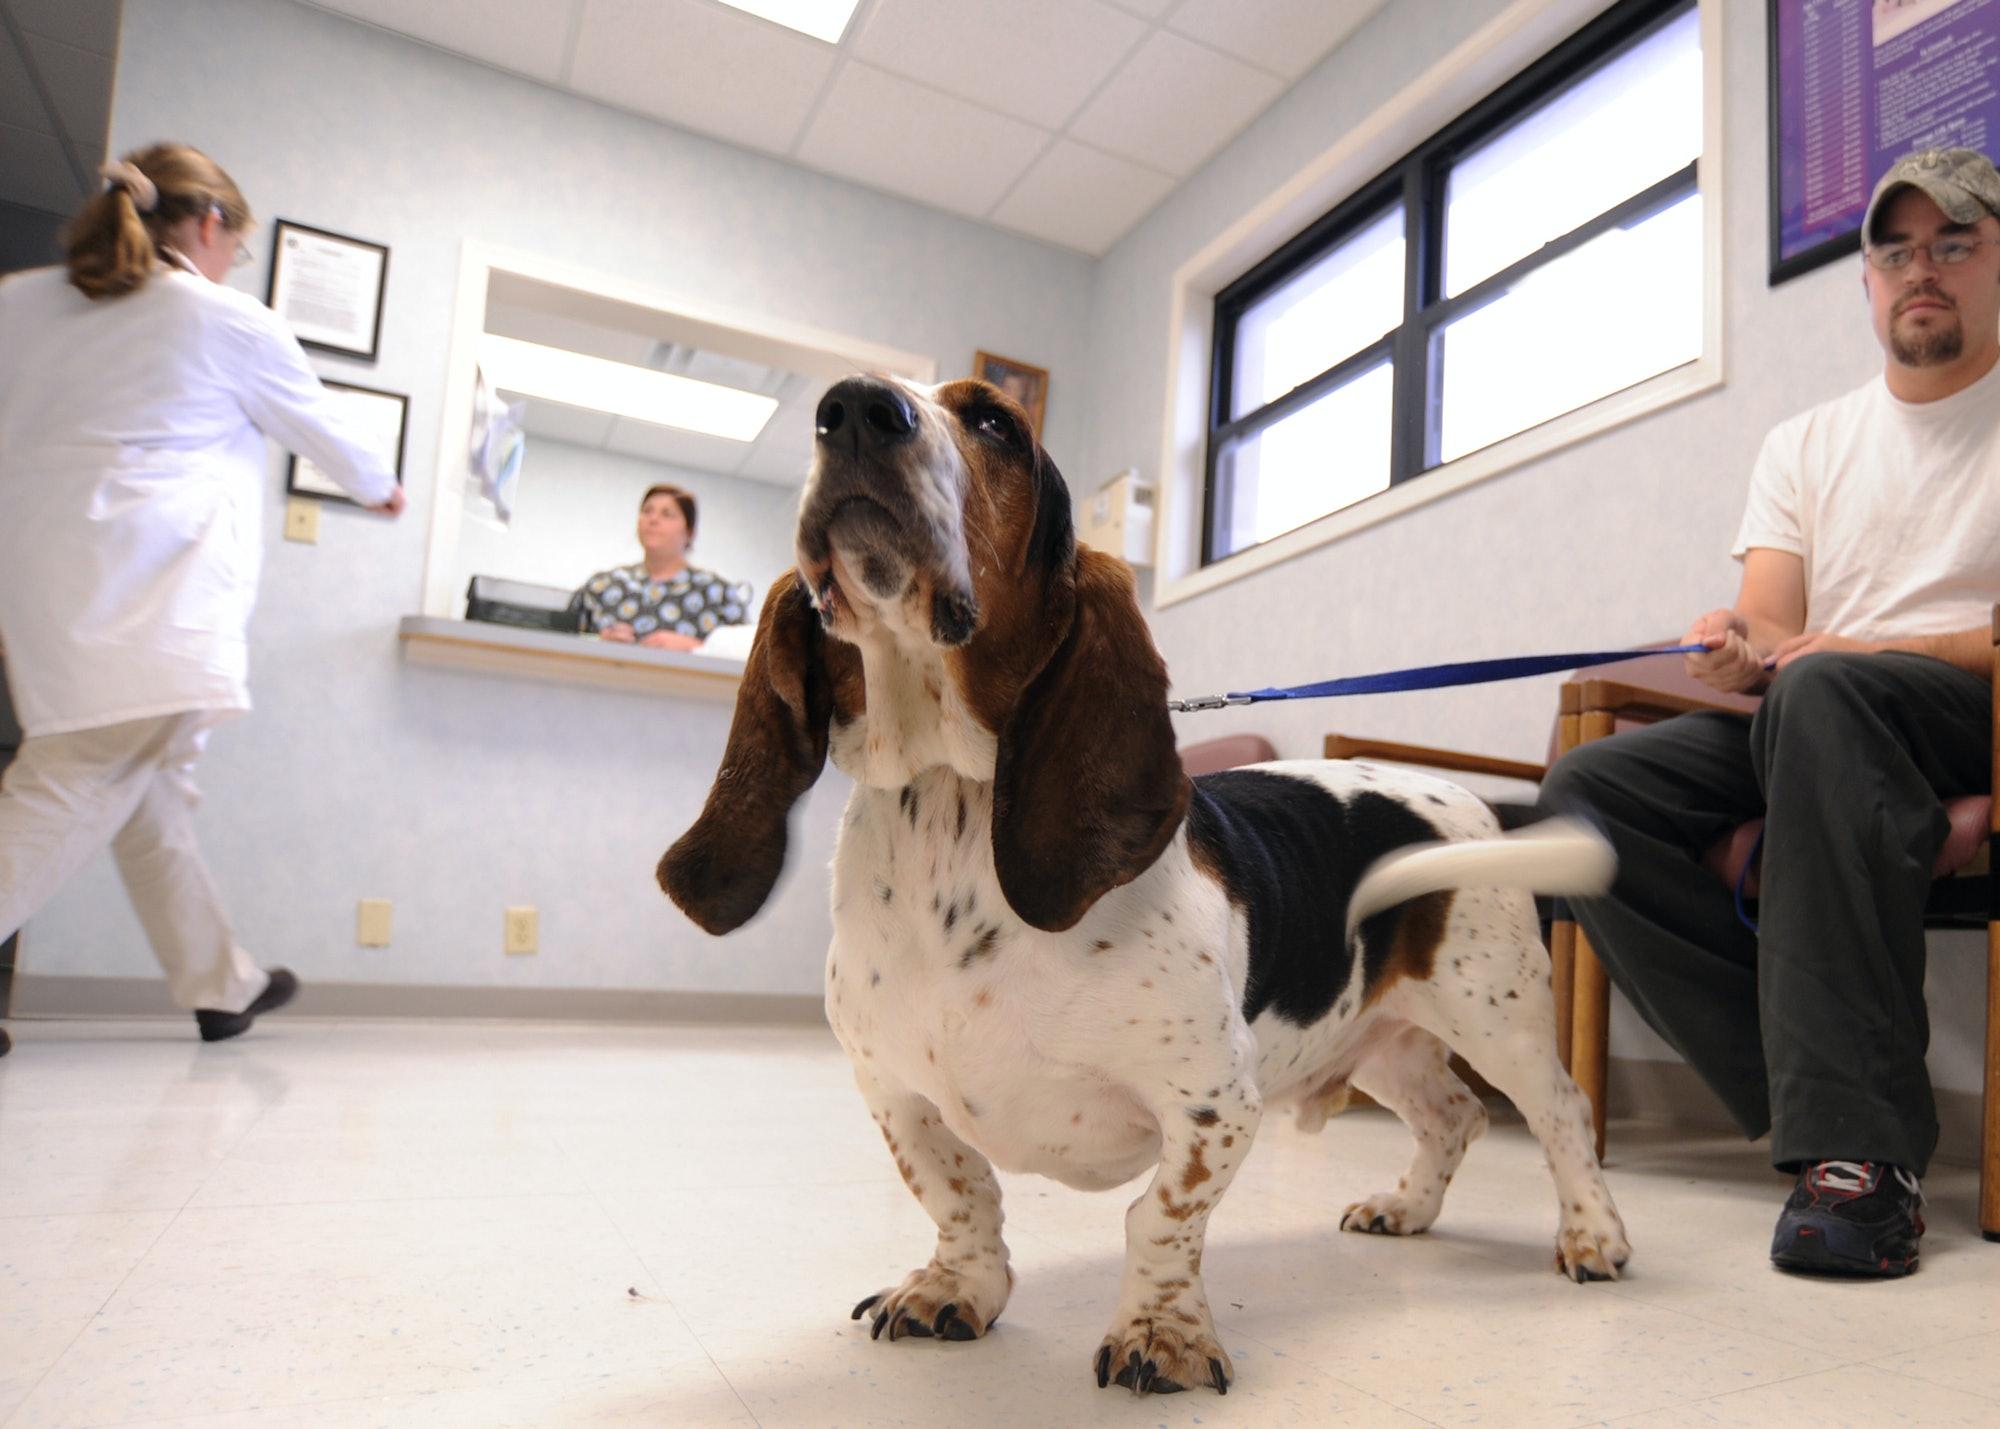 basset hound, dog, veterinarian